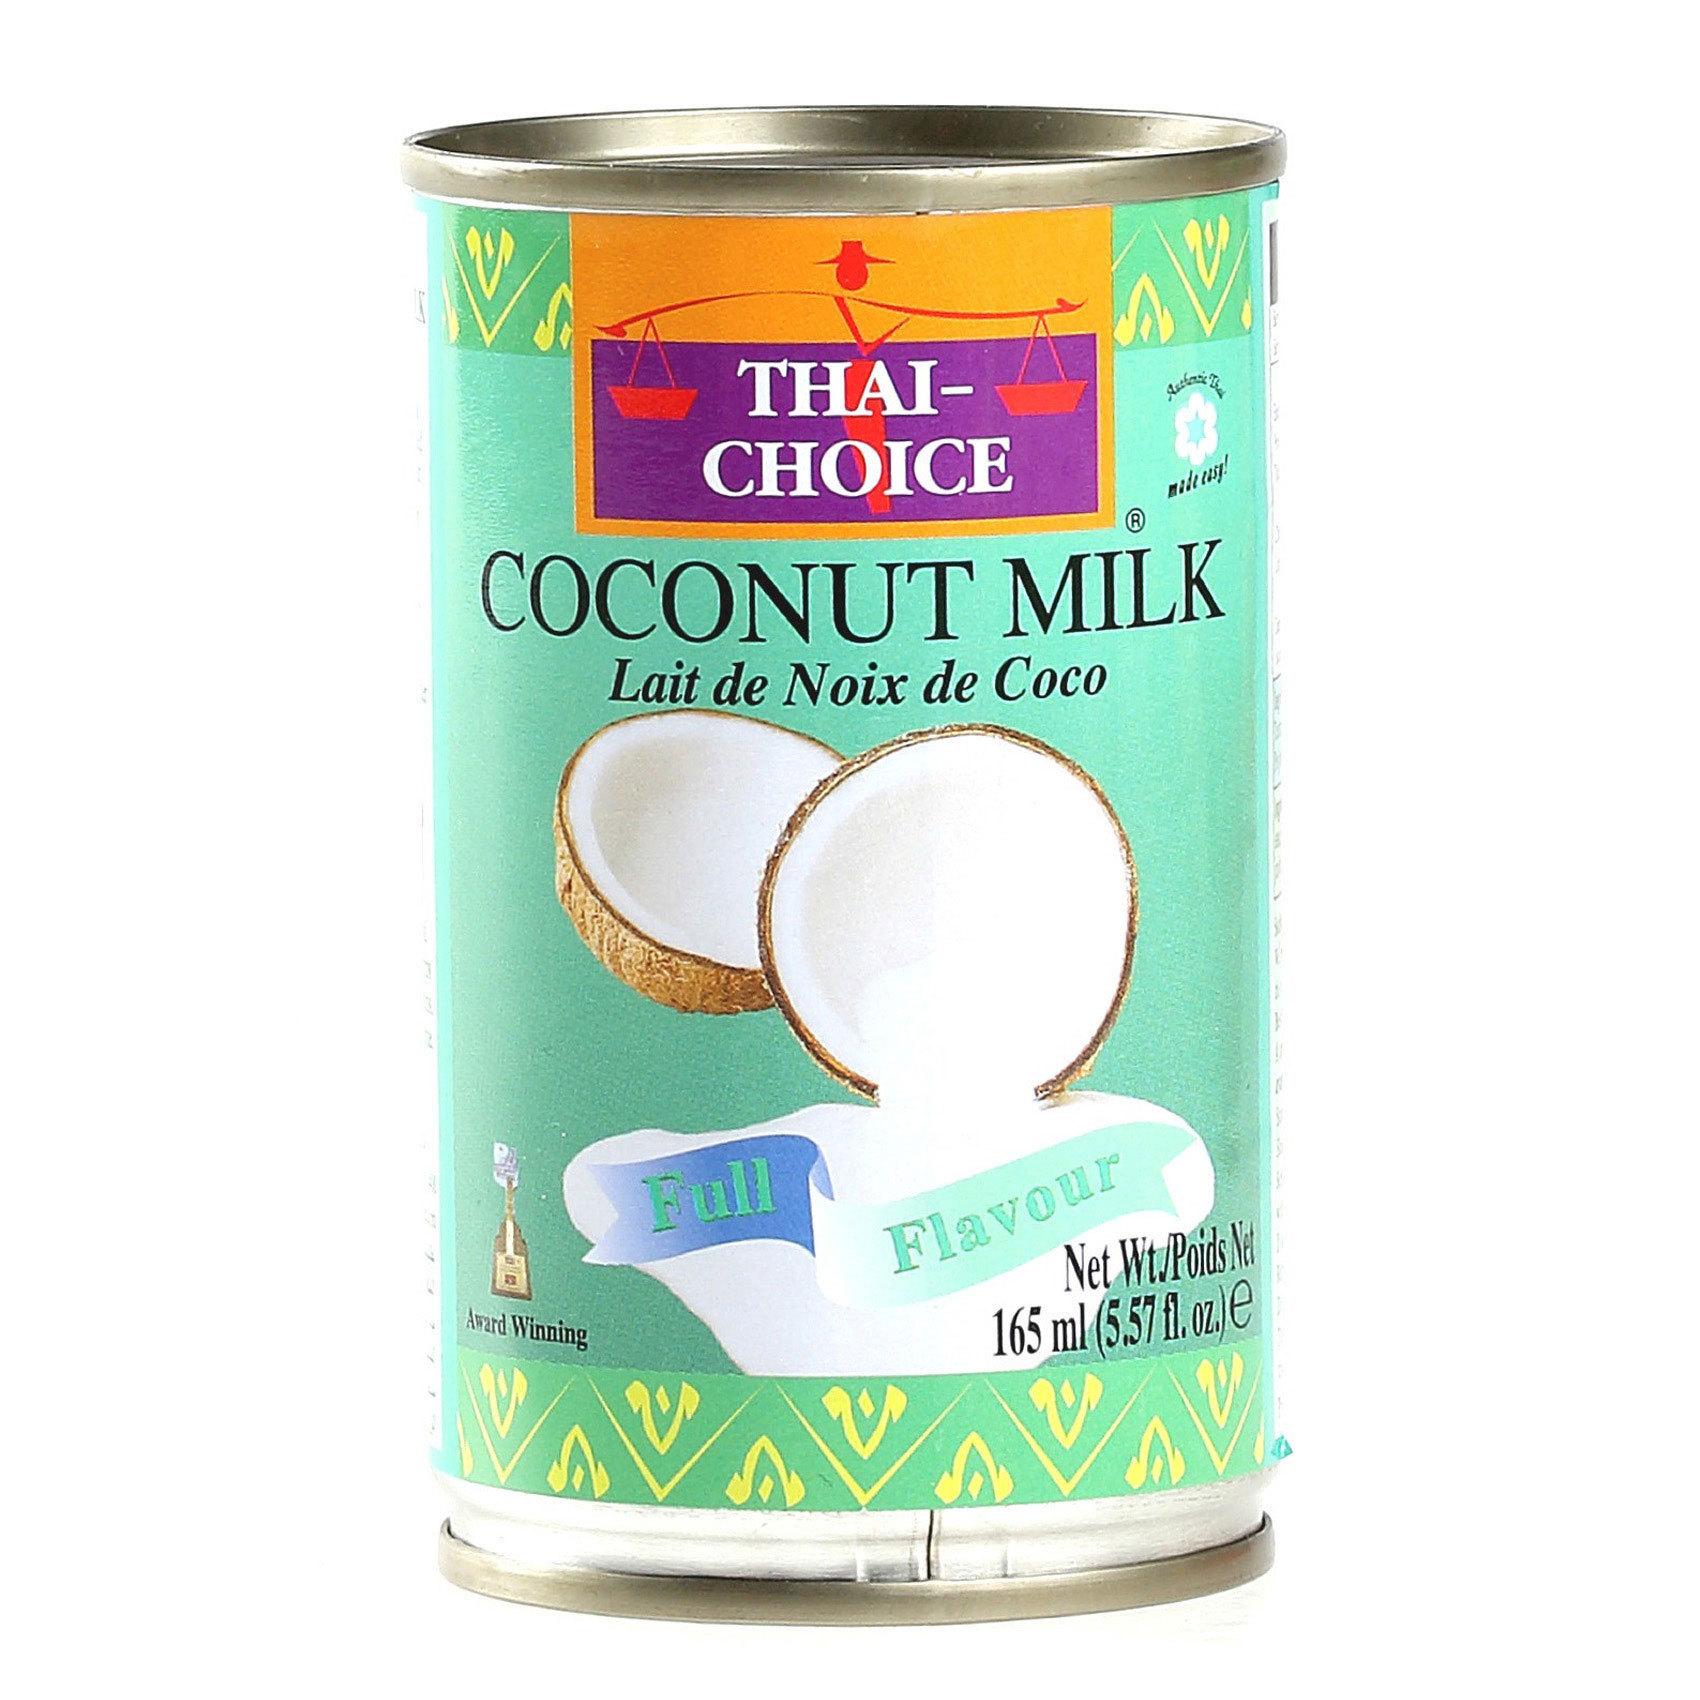 Buy Thai Chocie Coconut Milk 165ml Online in UAE - Carrefour UAE